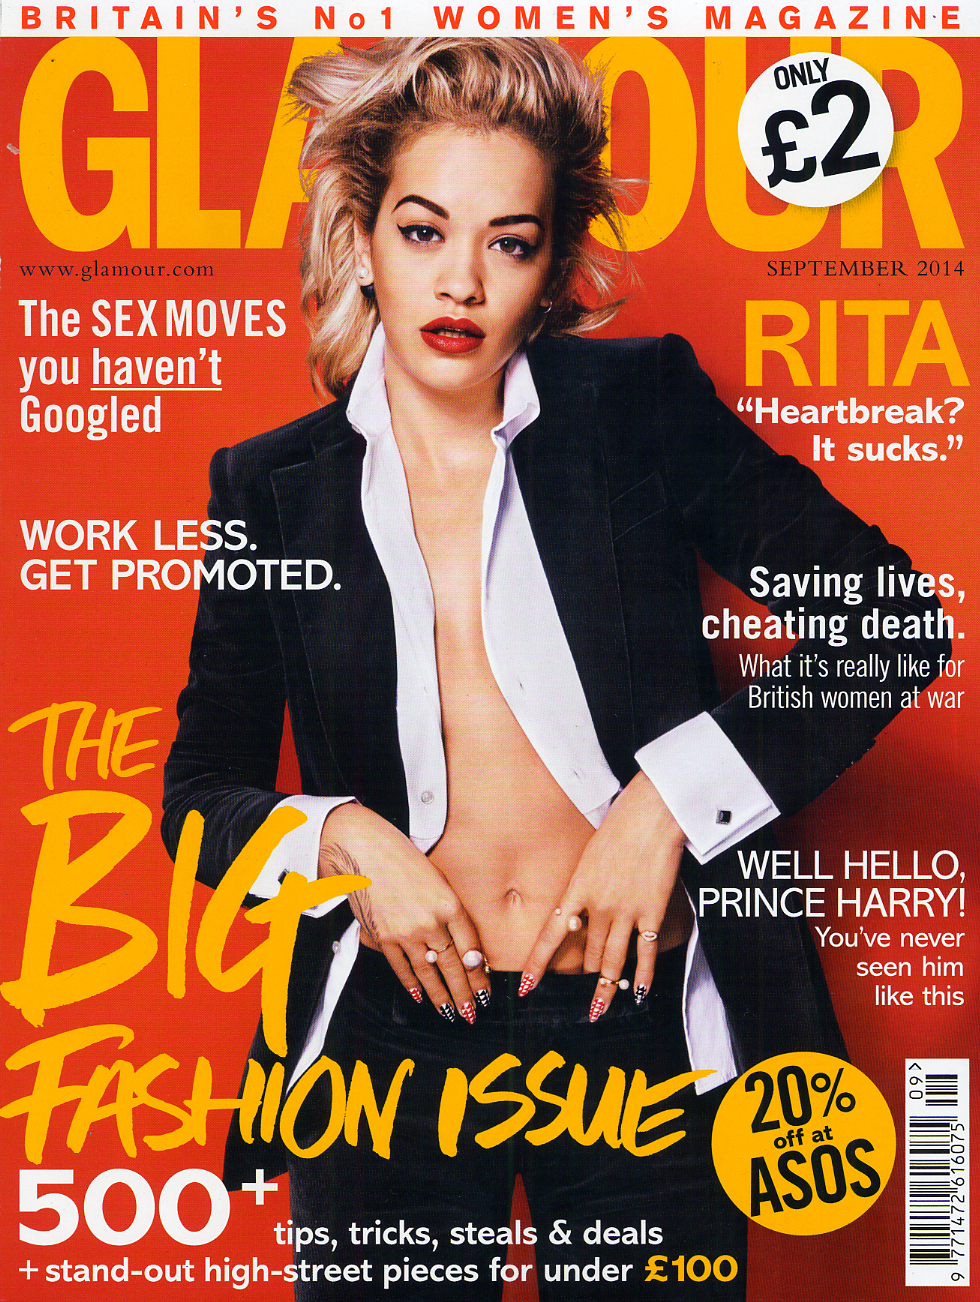 Glamour Cover Sep 14 .jpg